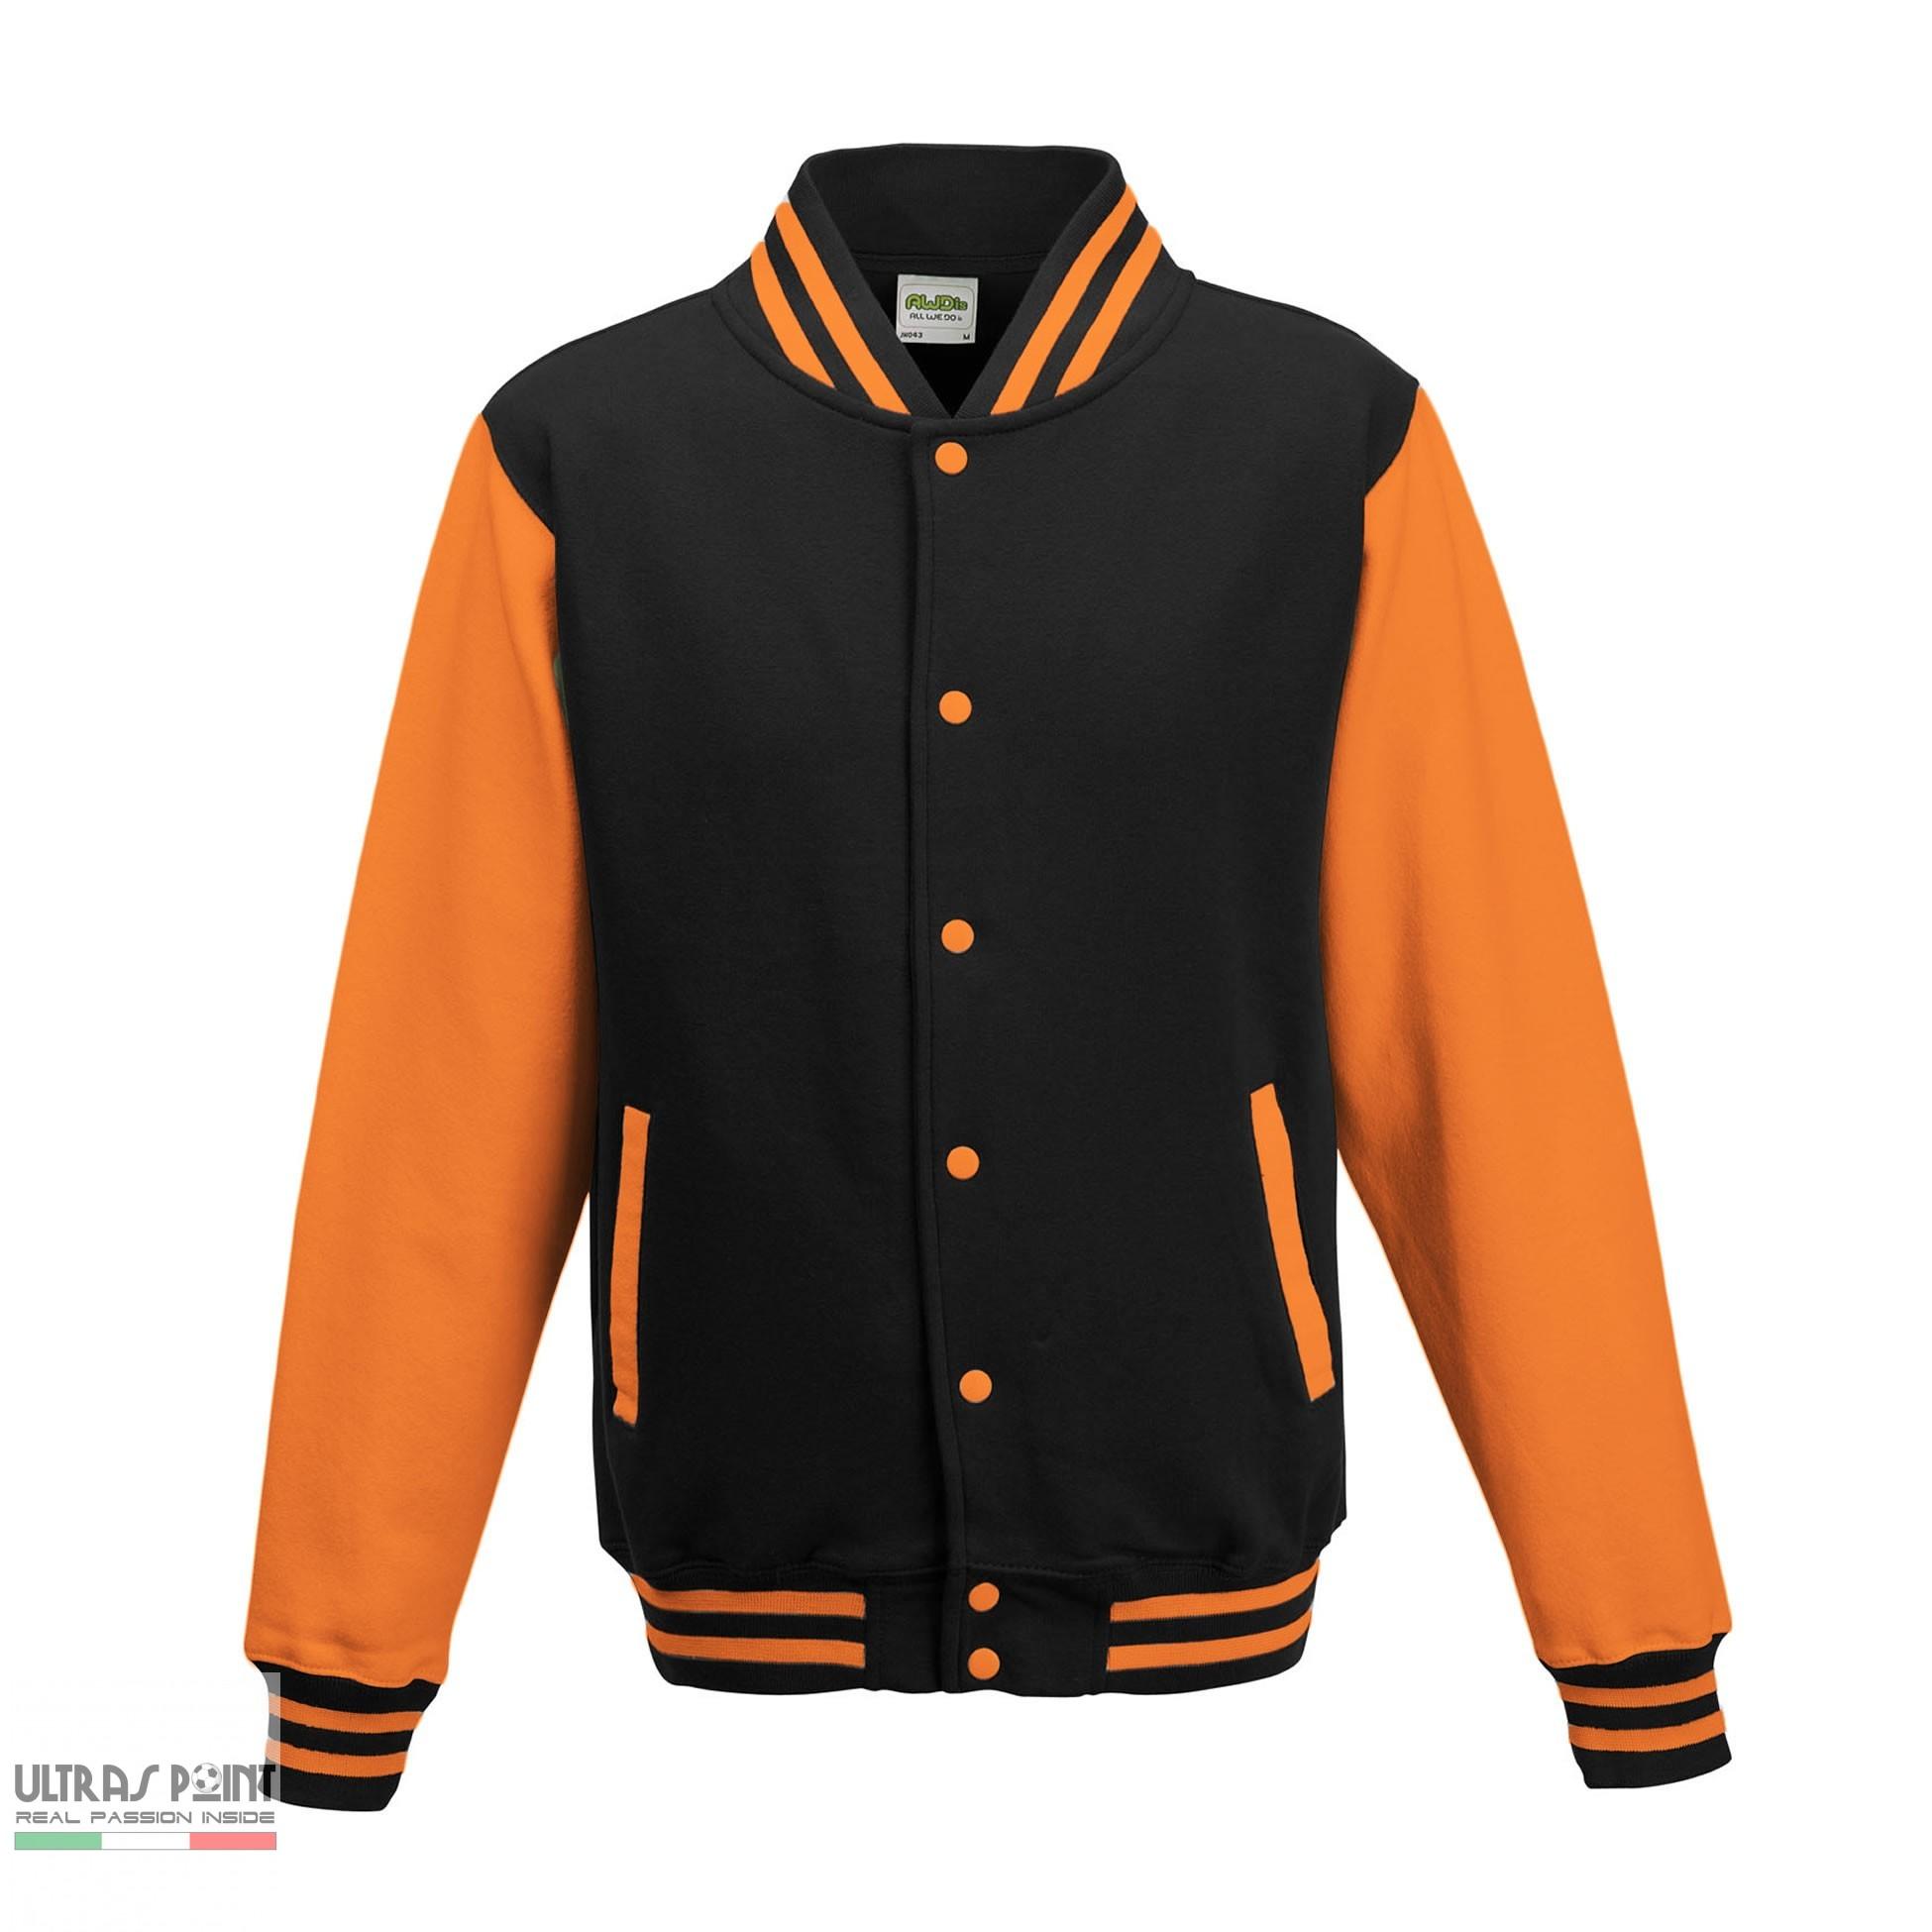 XL Colore Taglia Nero Giallo Felpa College Uomo Giacca Baseball AWDis Varsity Jacket Maniche A Contrasto